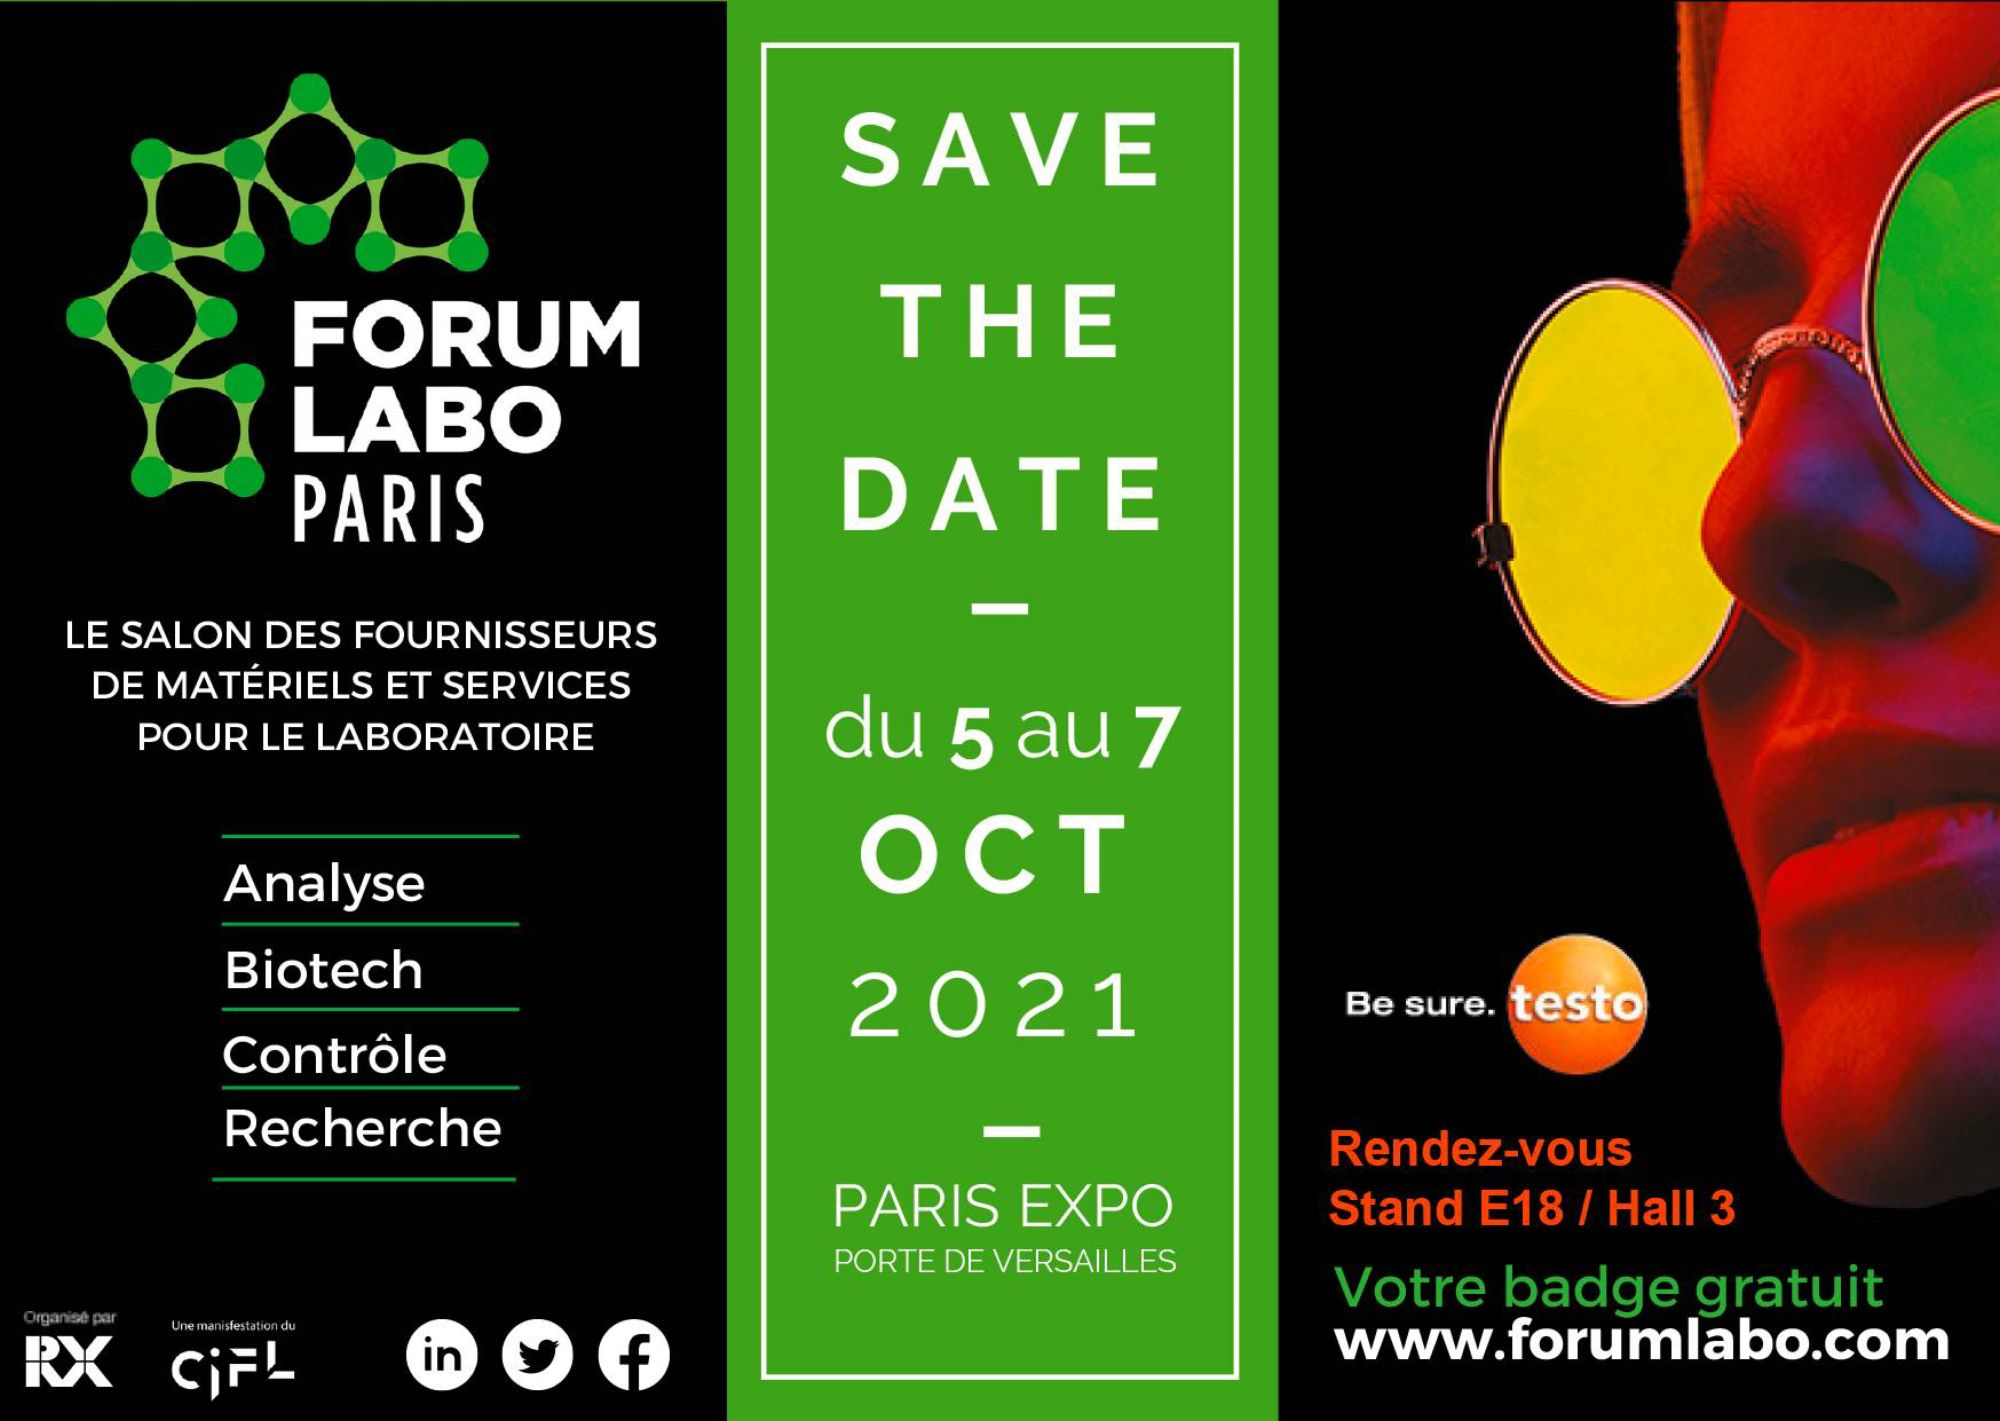 SAVE-THE-DATE-FORUMLABO-PARIS21-FR-LINK.jpg